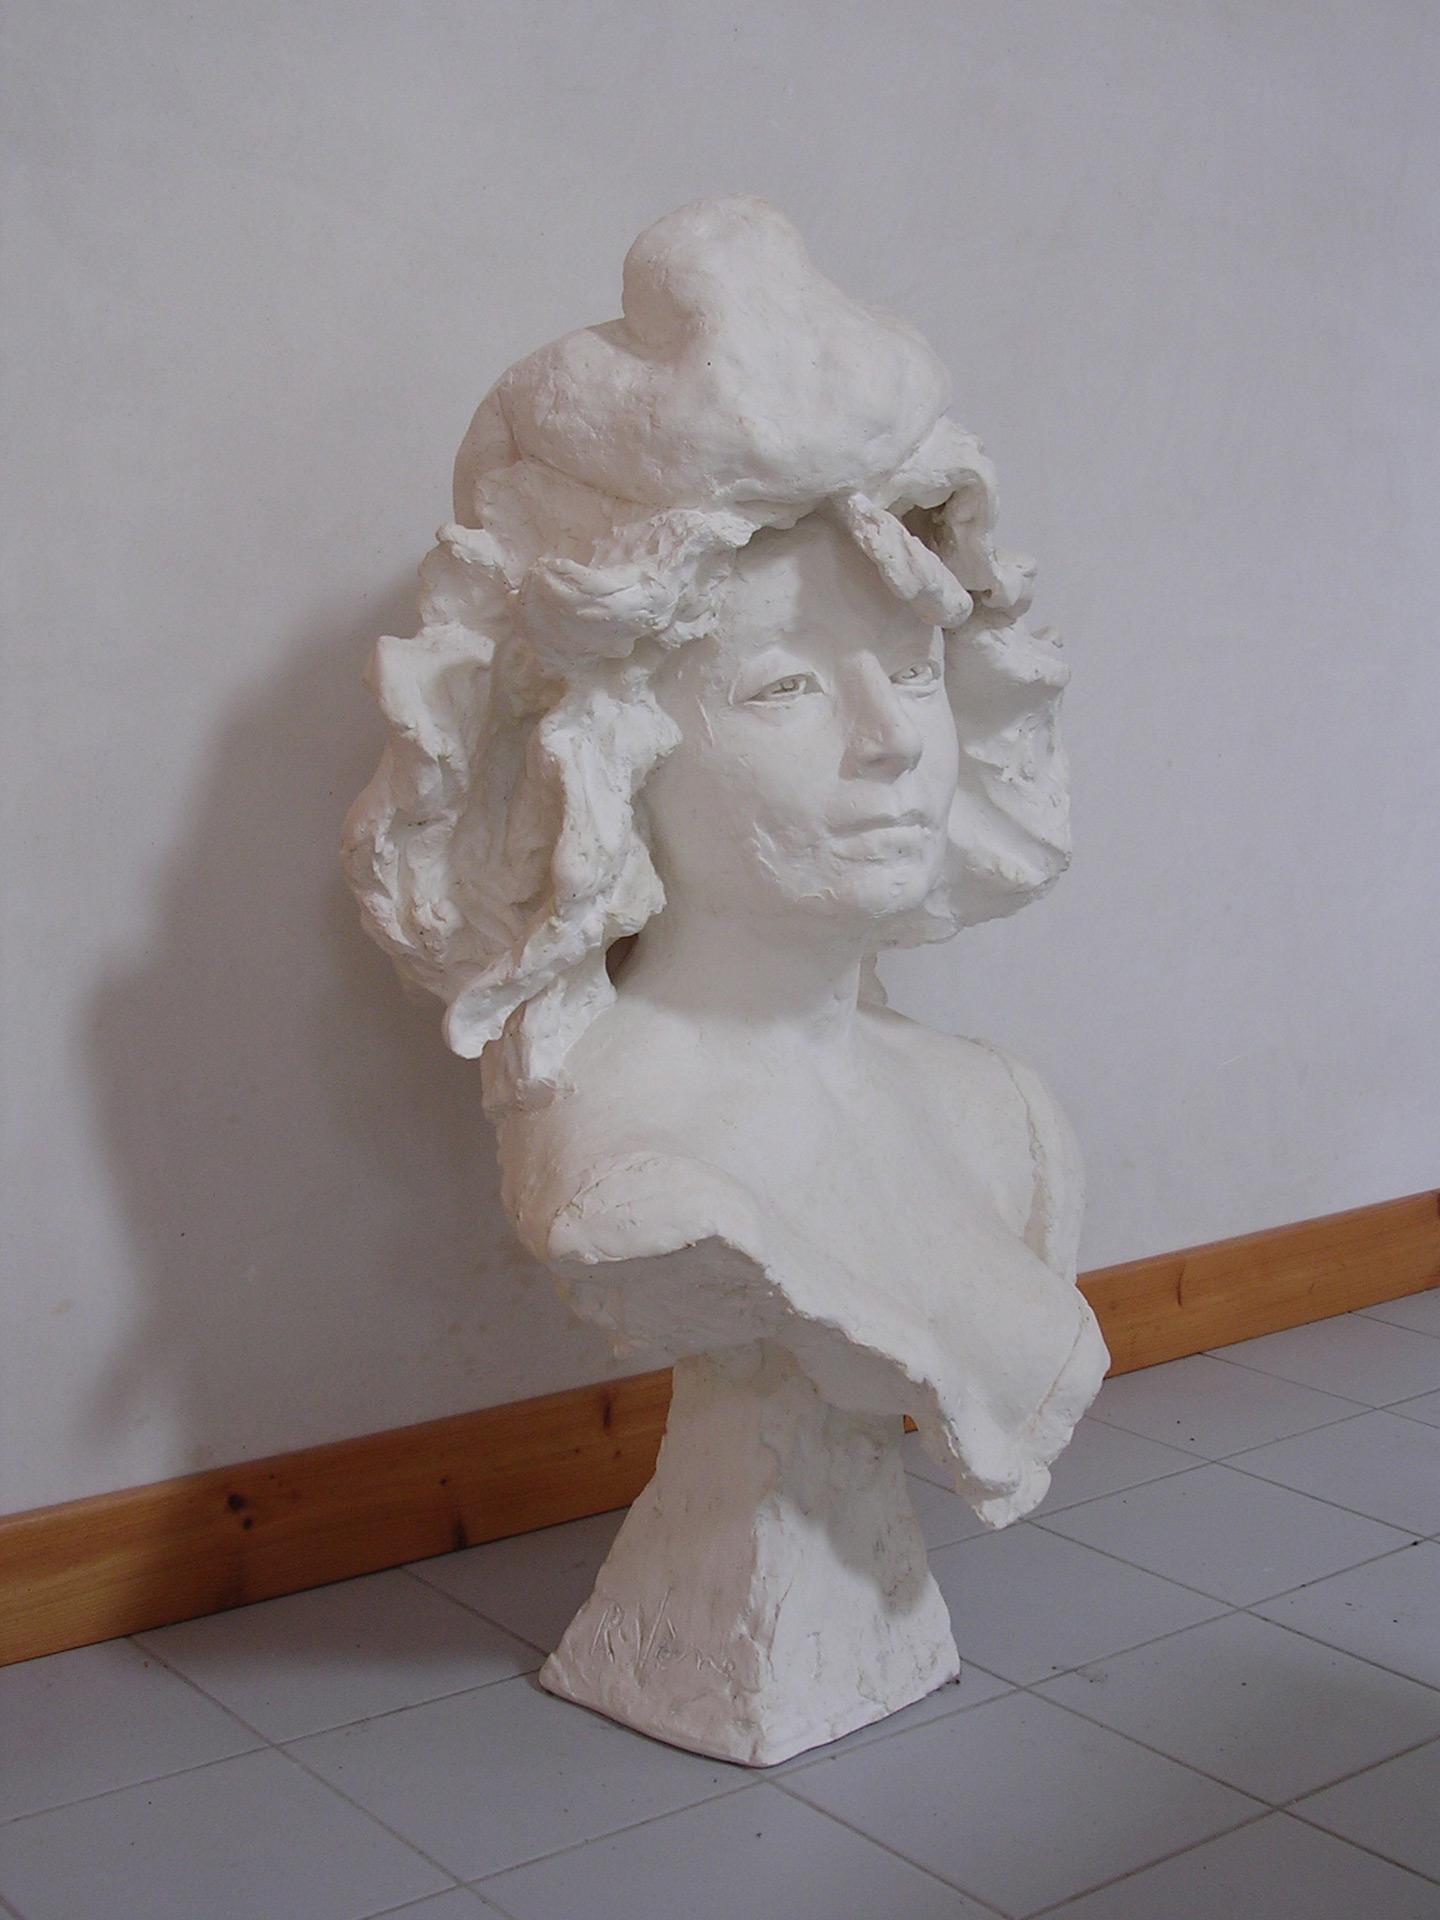 Regine-Desfforges-en-marianne-H80cm-Platre-1